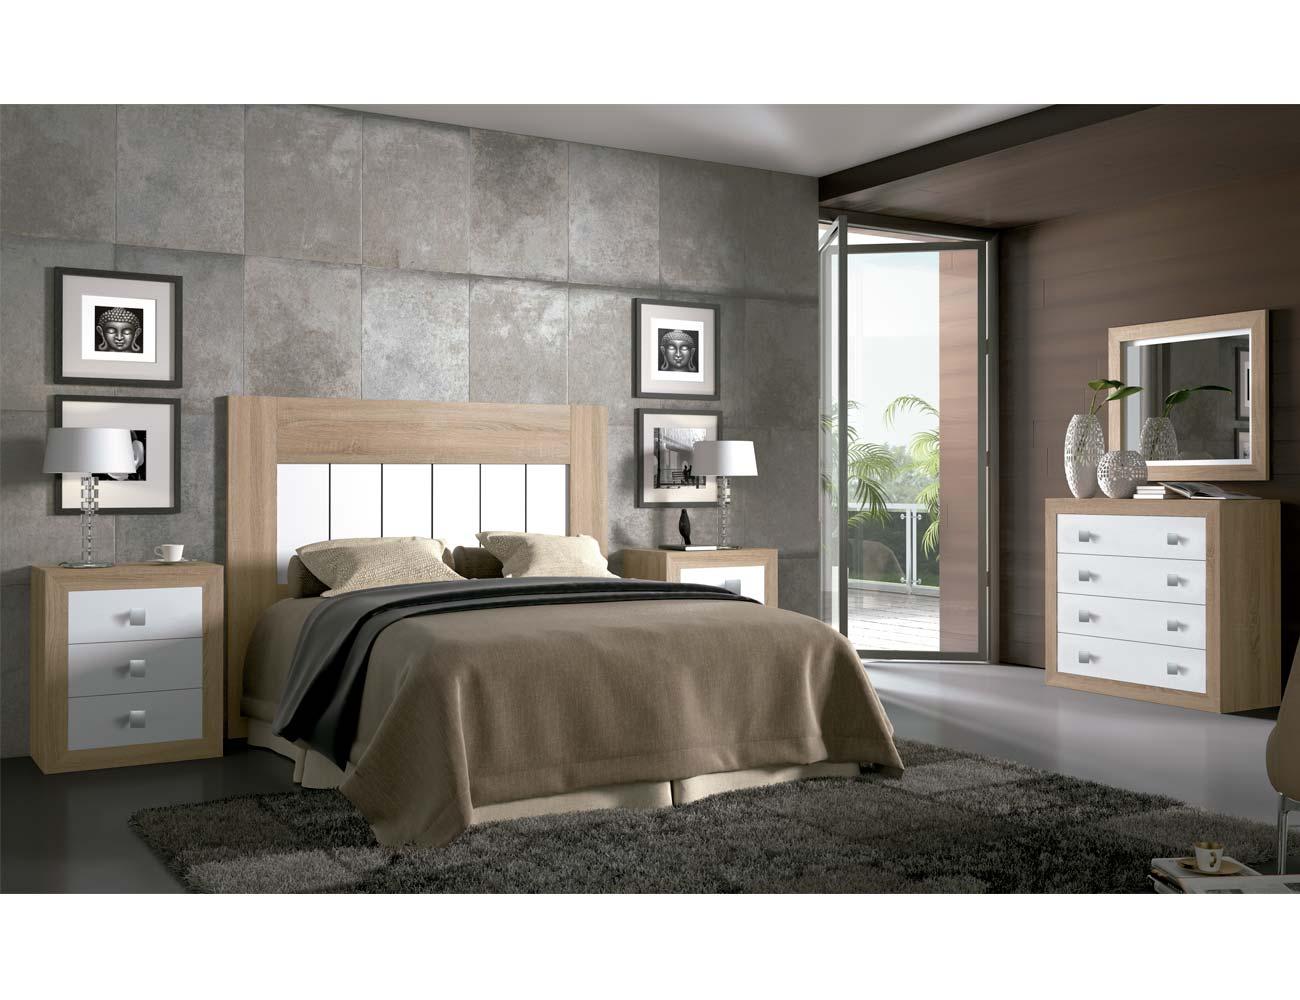 Dormitorio matrimonio moderno 07 cambrian blanco